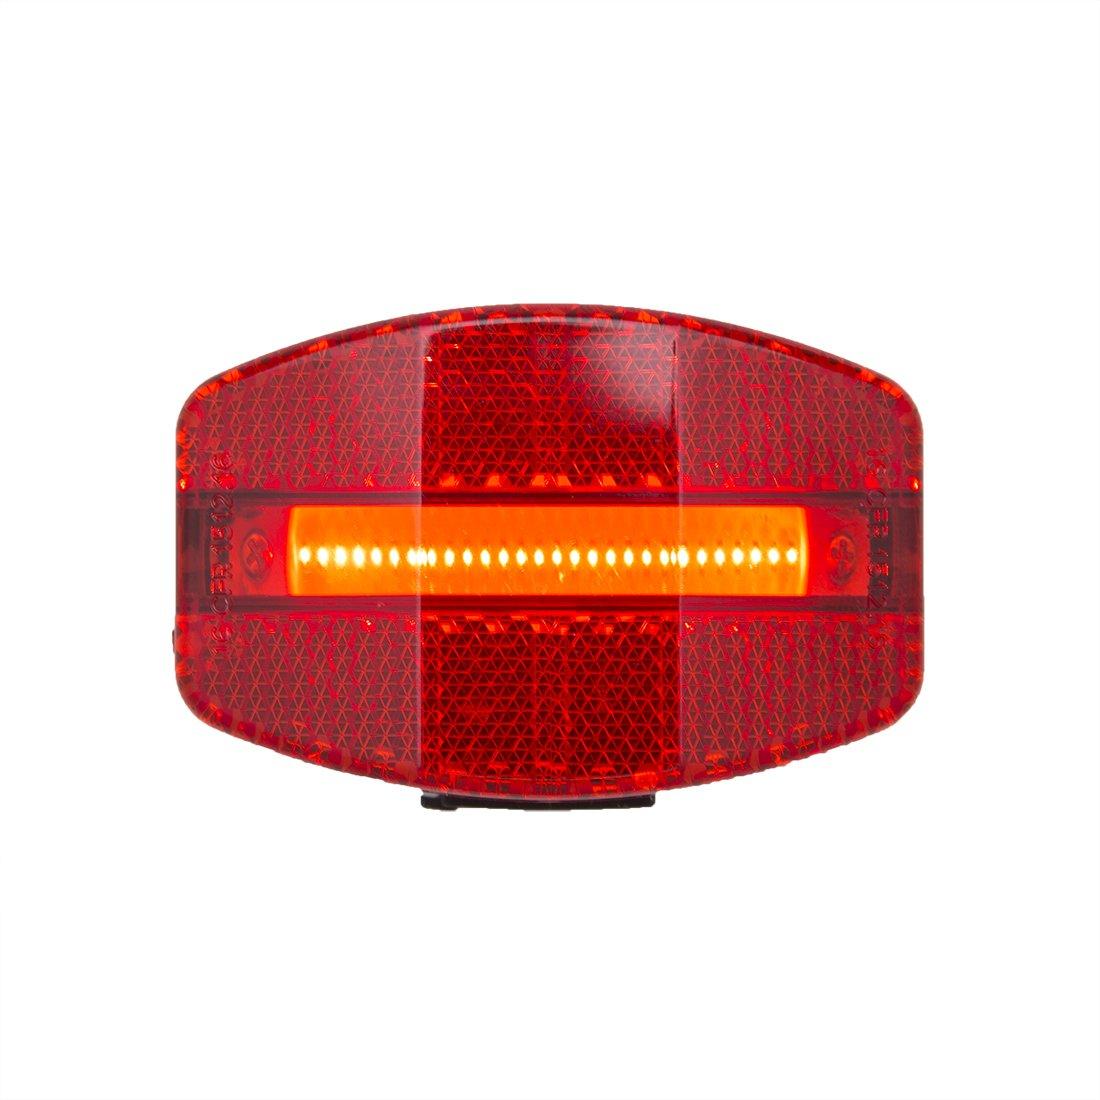 Planet Bike Grateful USB Bike Tail Light, Red/Black